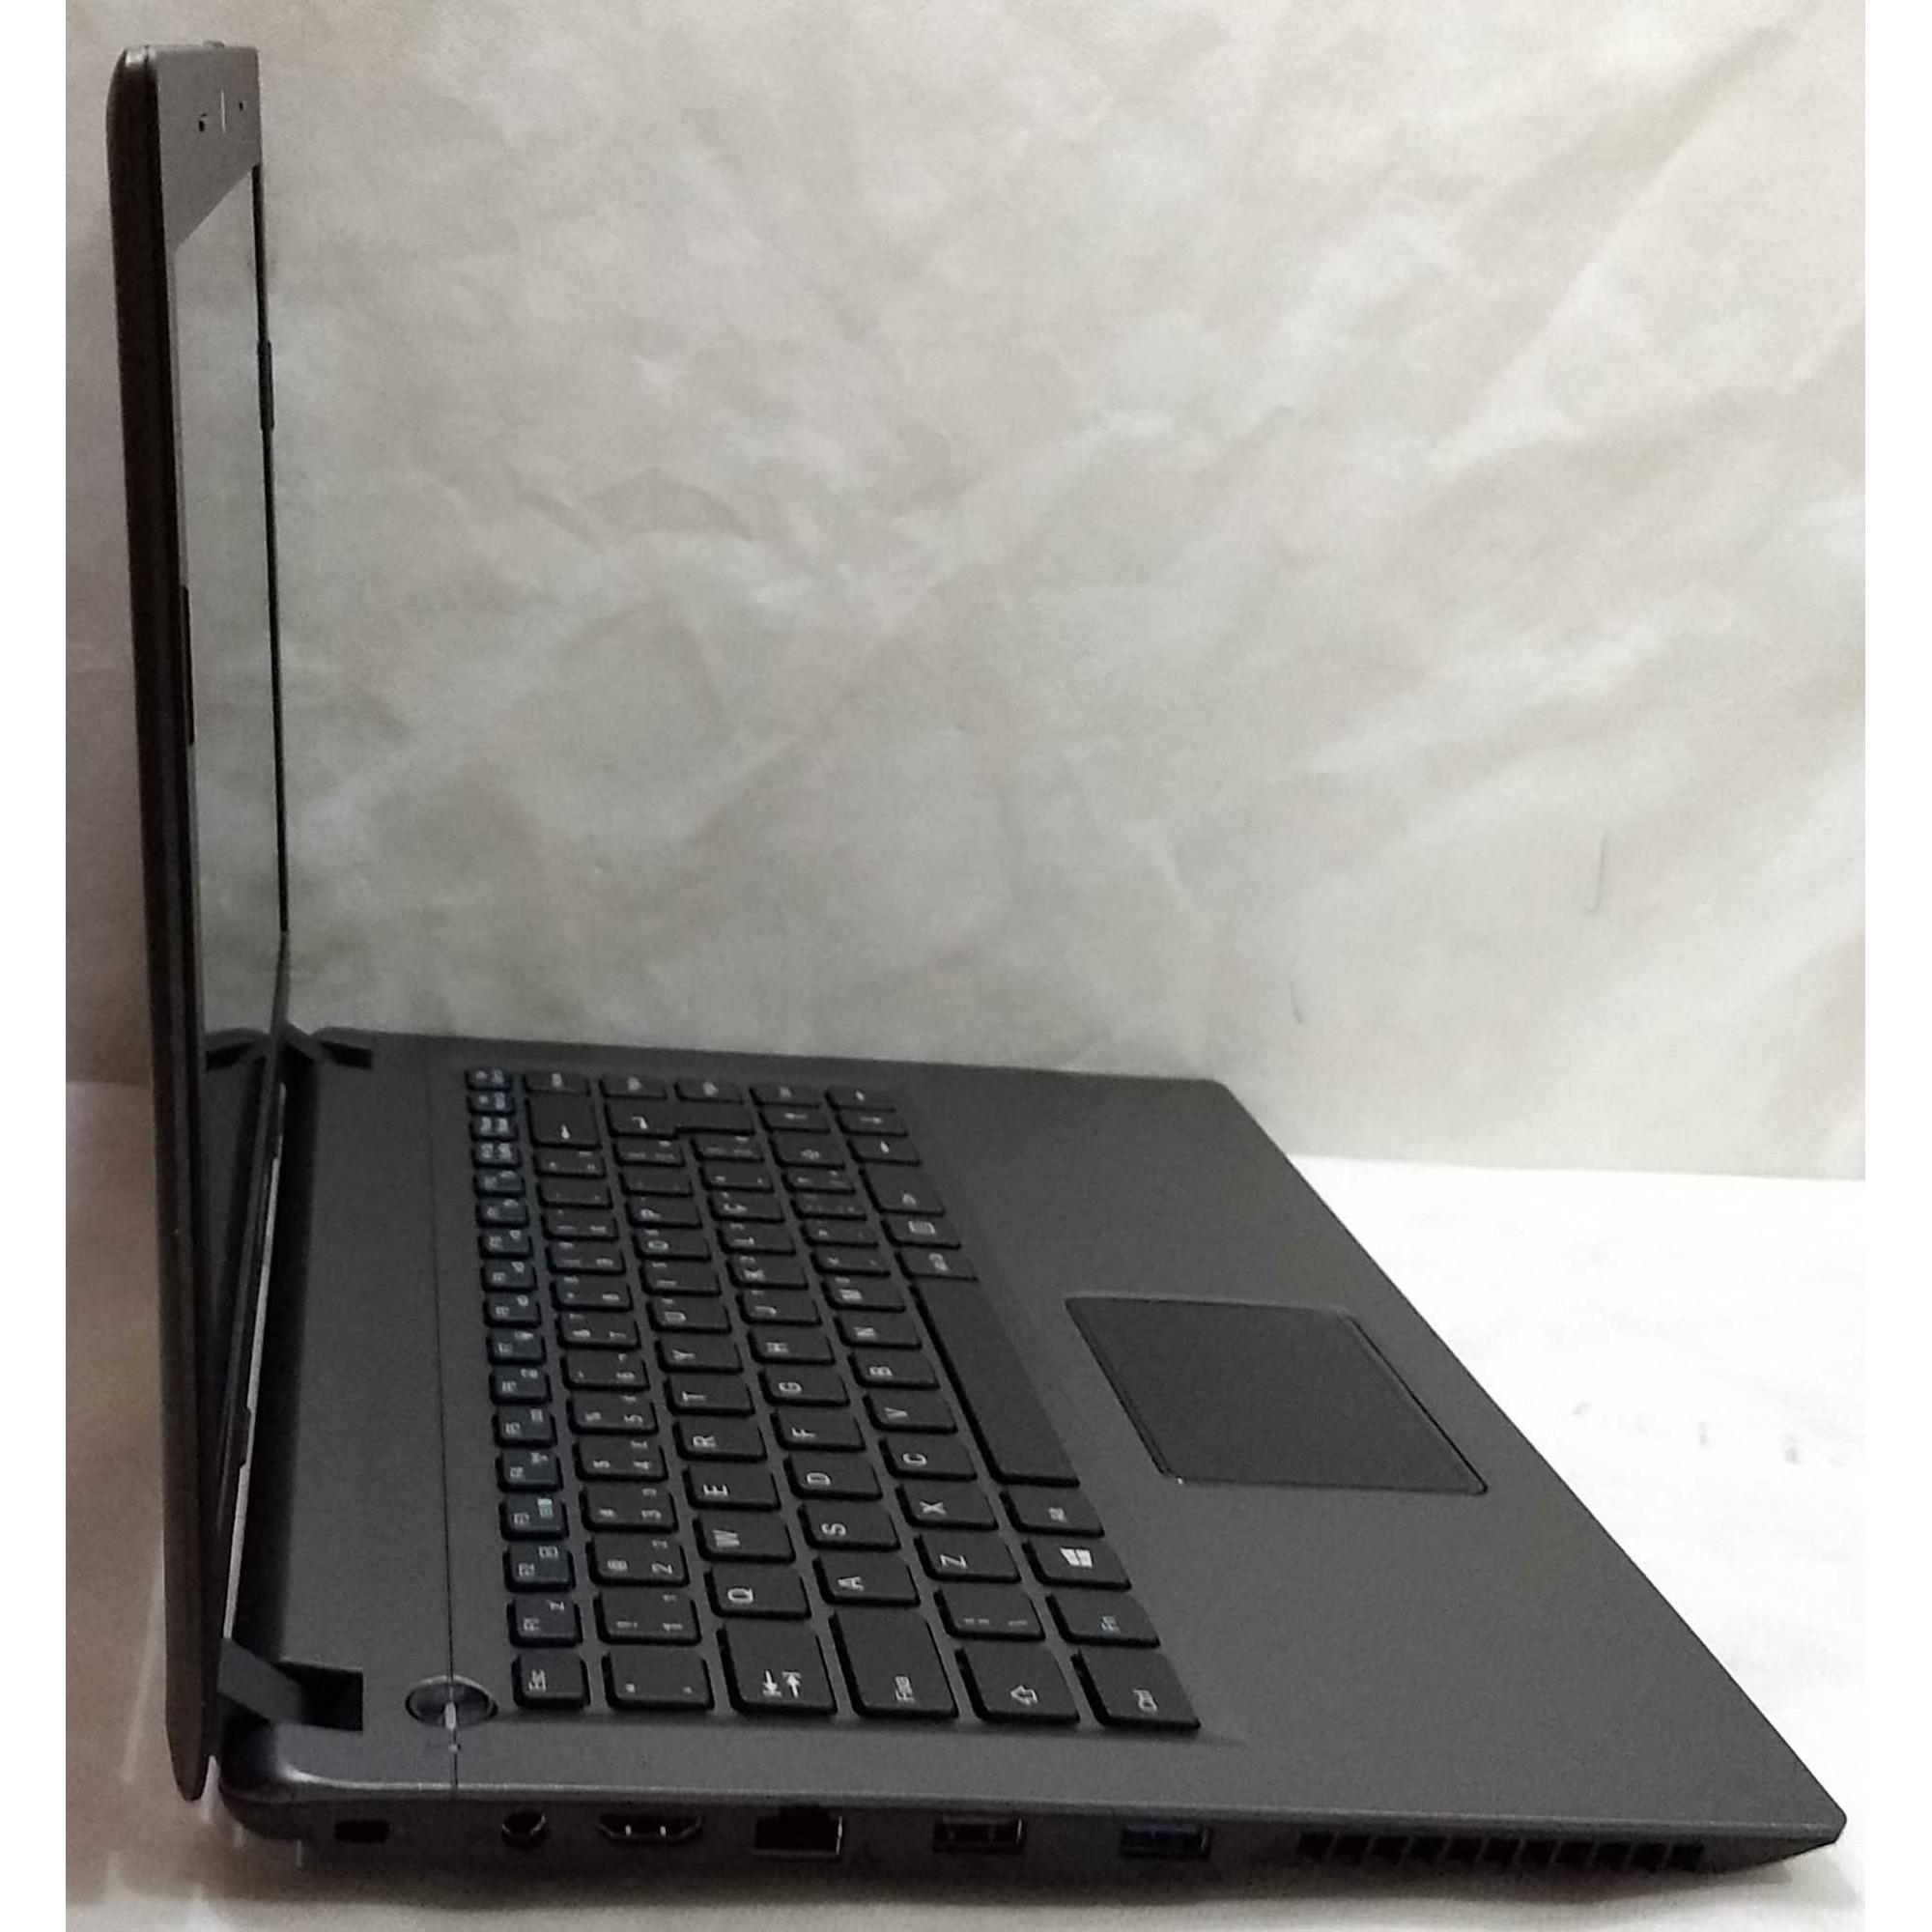 Notebook Compaq Presario CQ-23 14''  Celeron Dual Core 2.2GHz 4GB HD-500GB